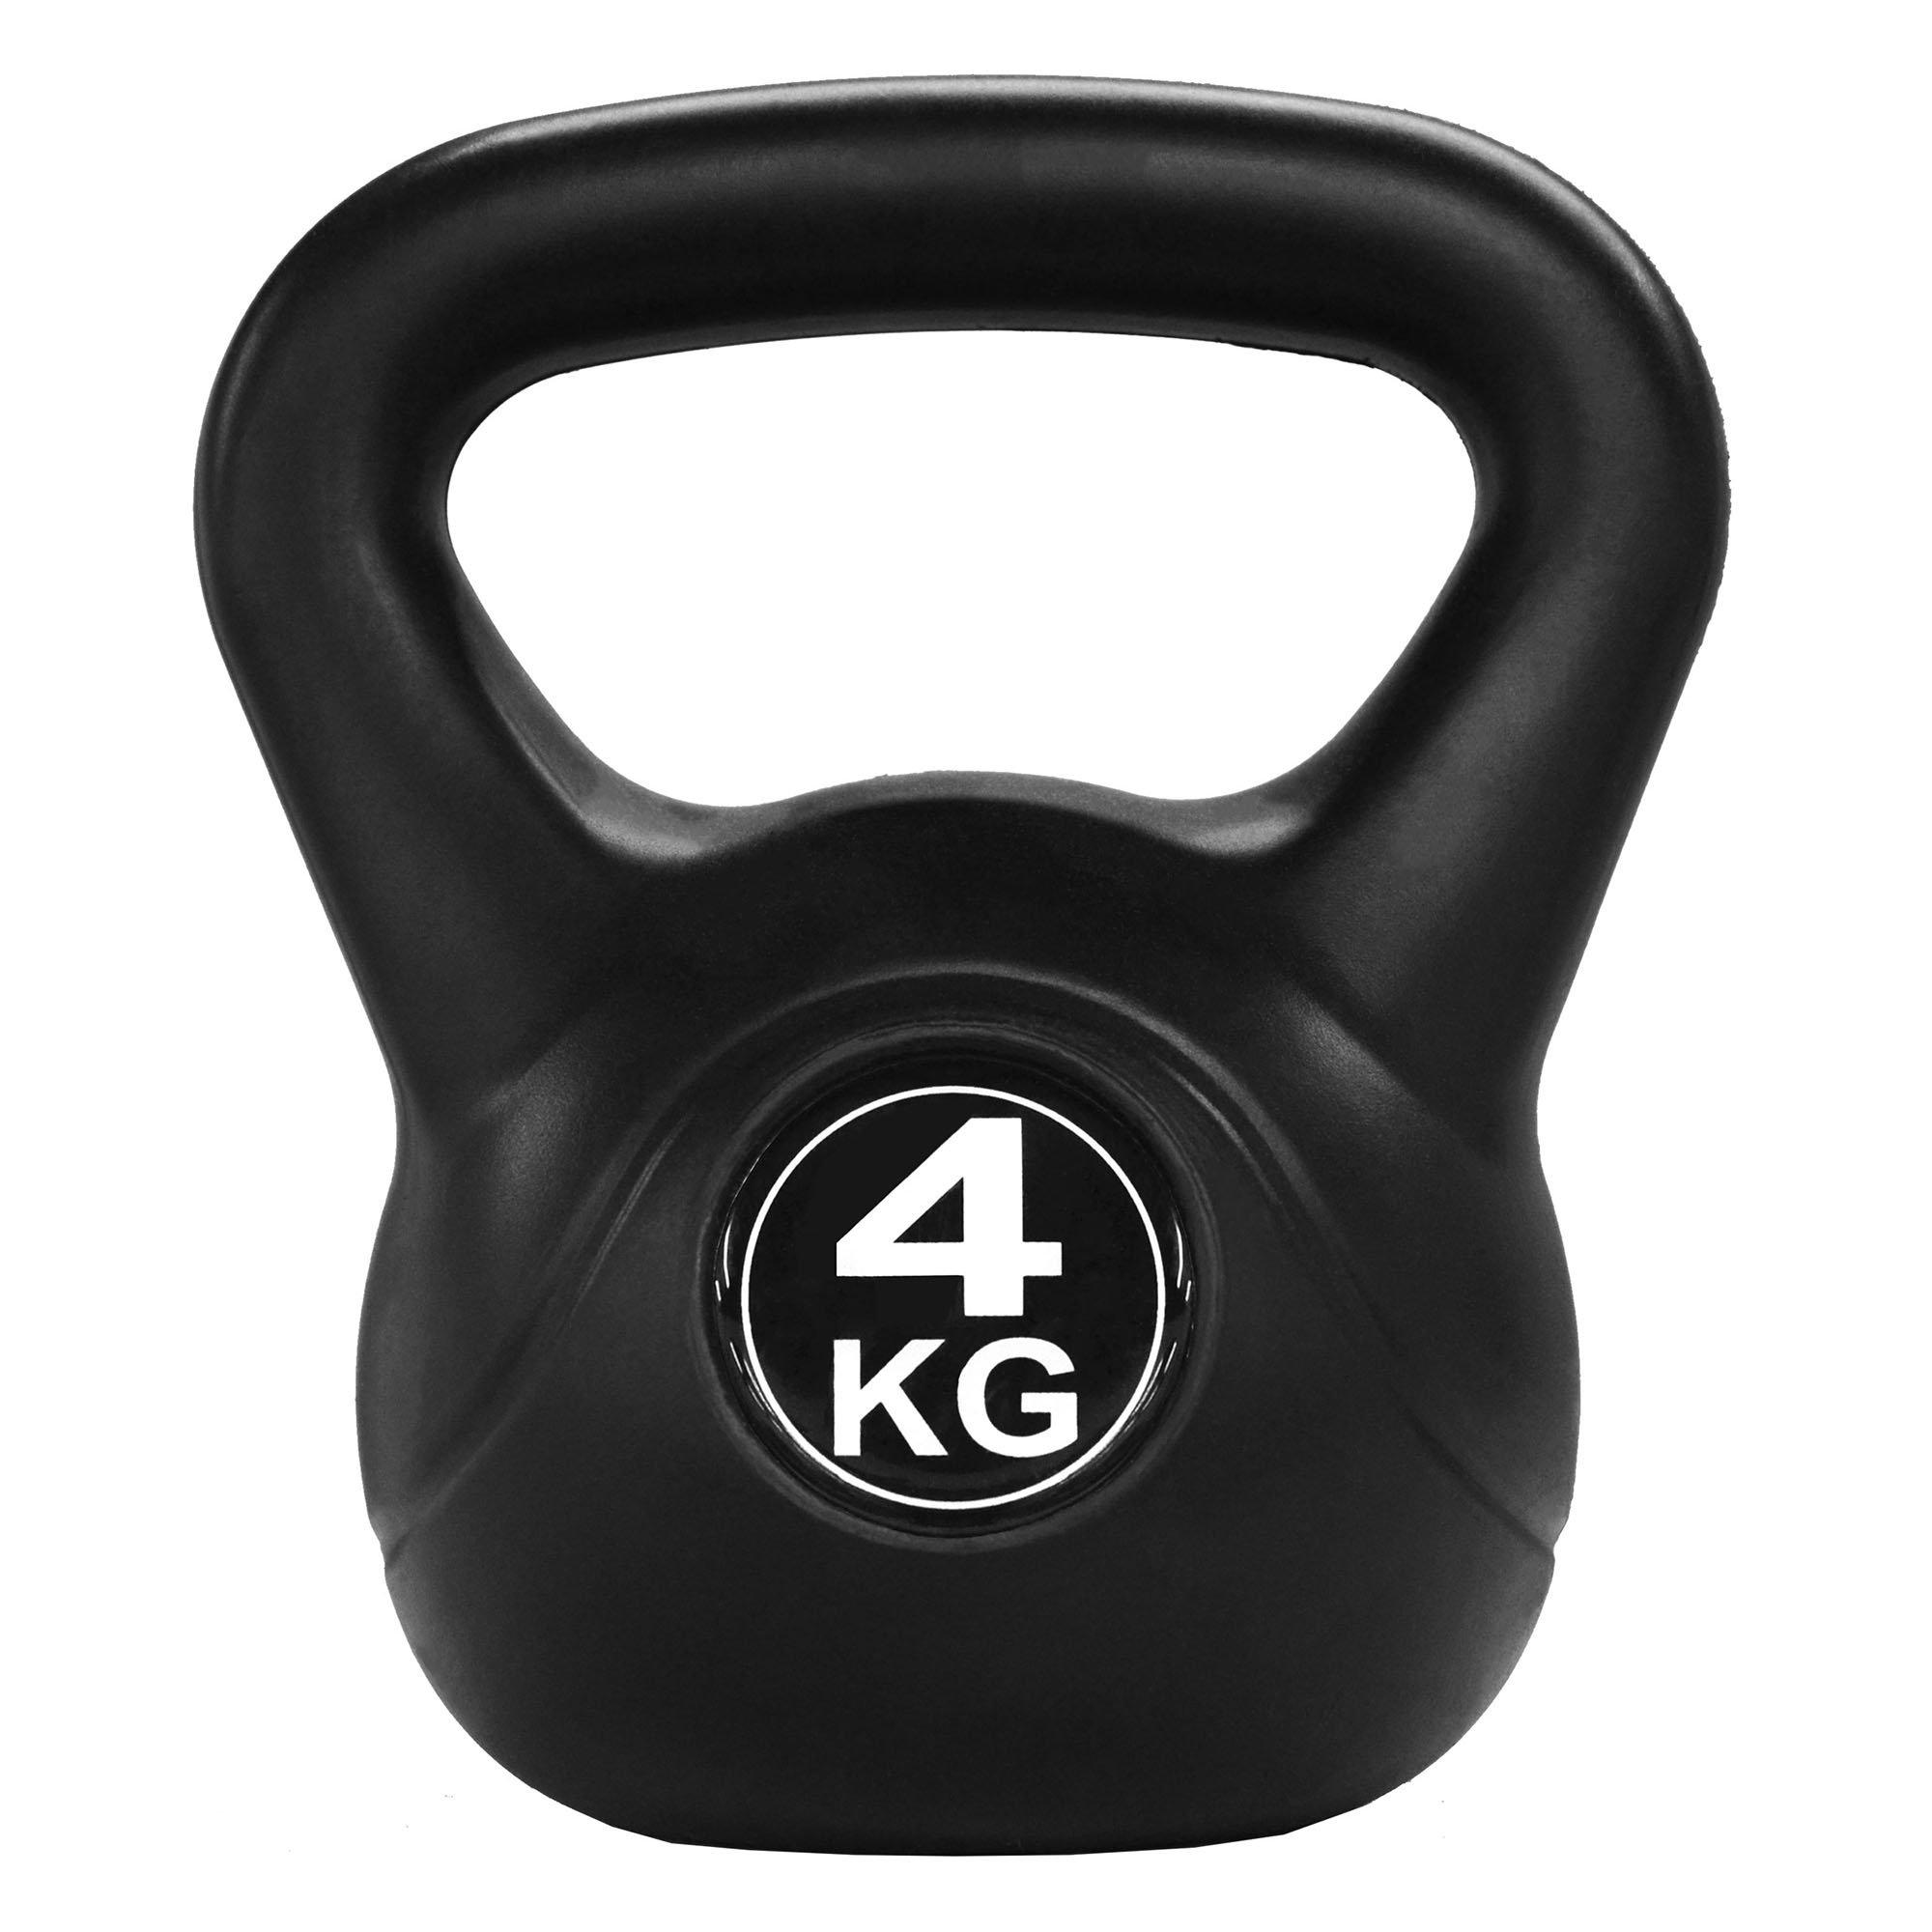 Athlyt Unisexs Cast Kettlebell Ergo 12 kg Black